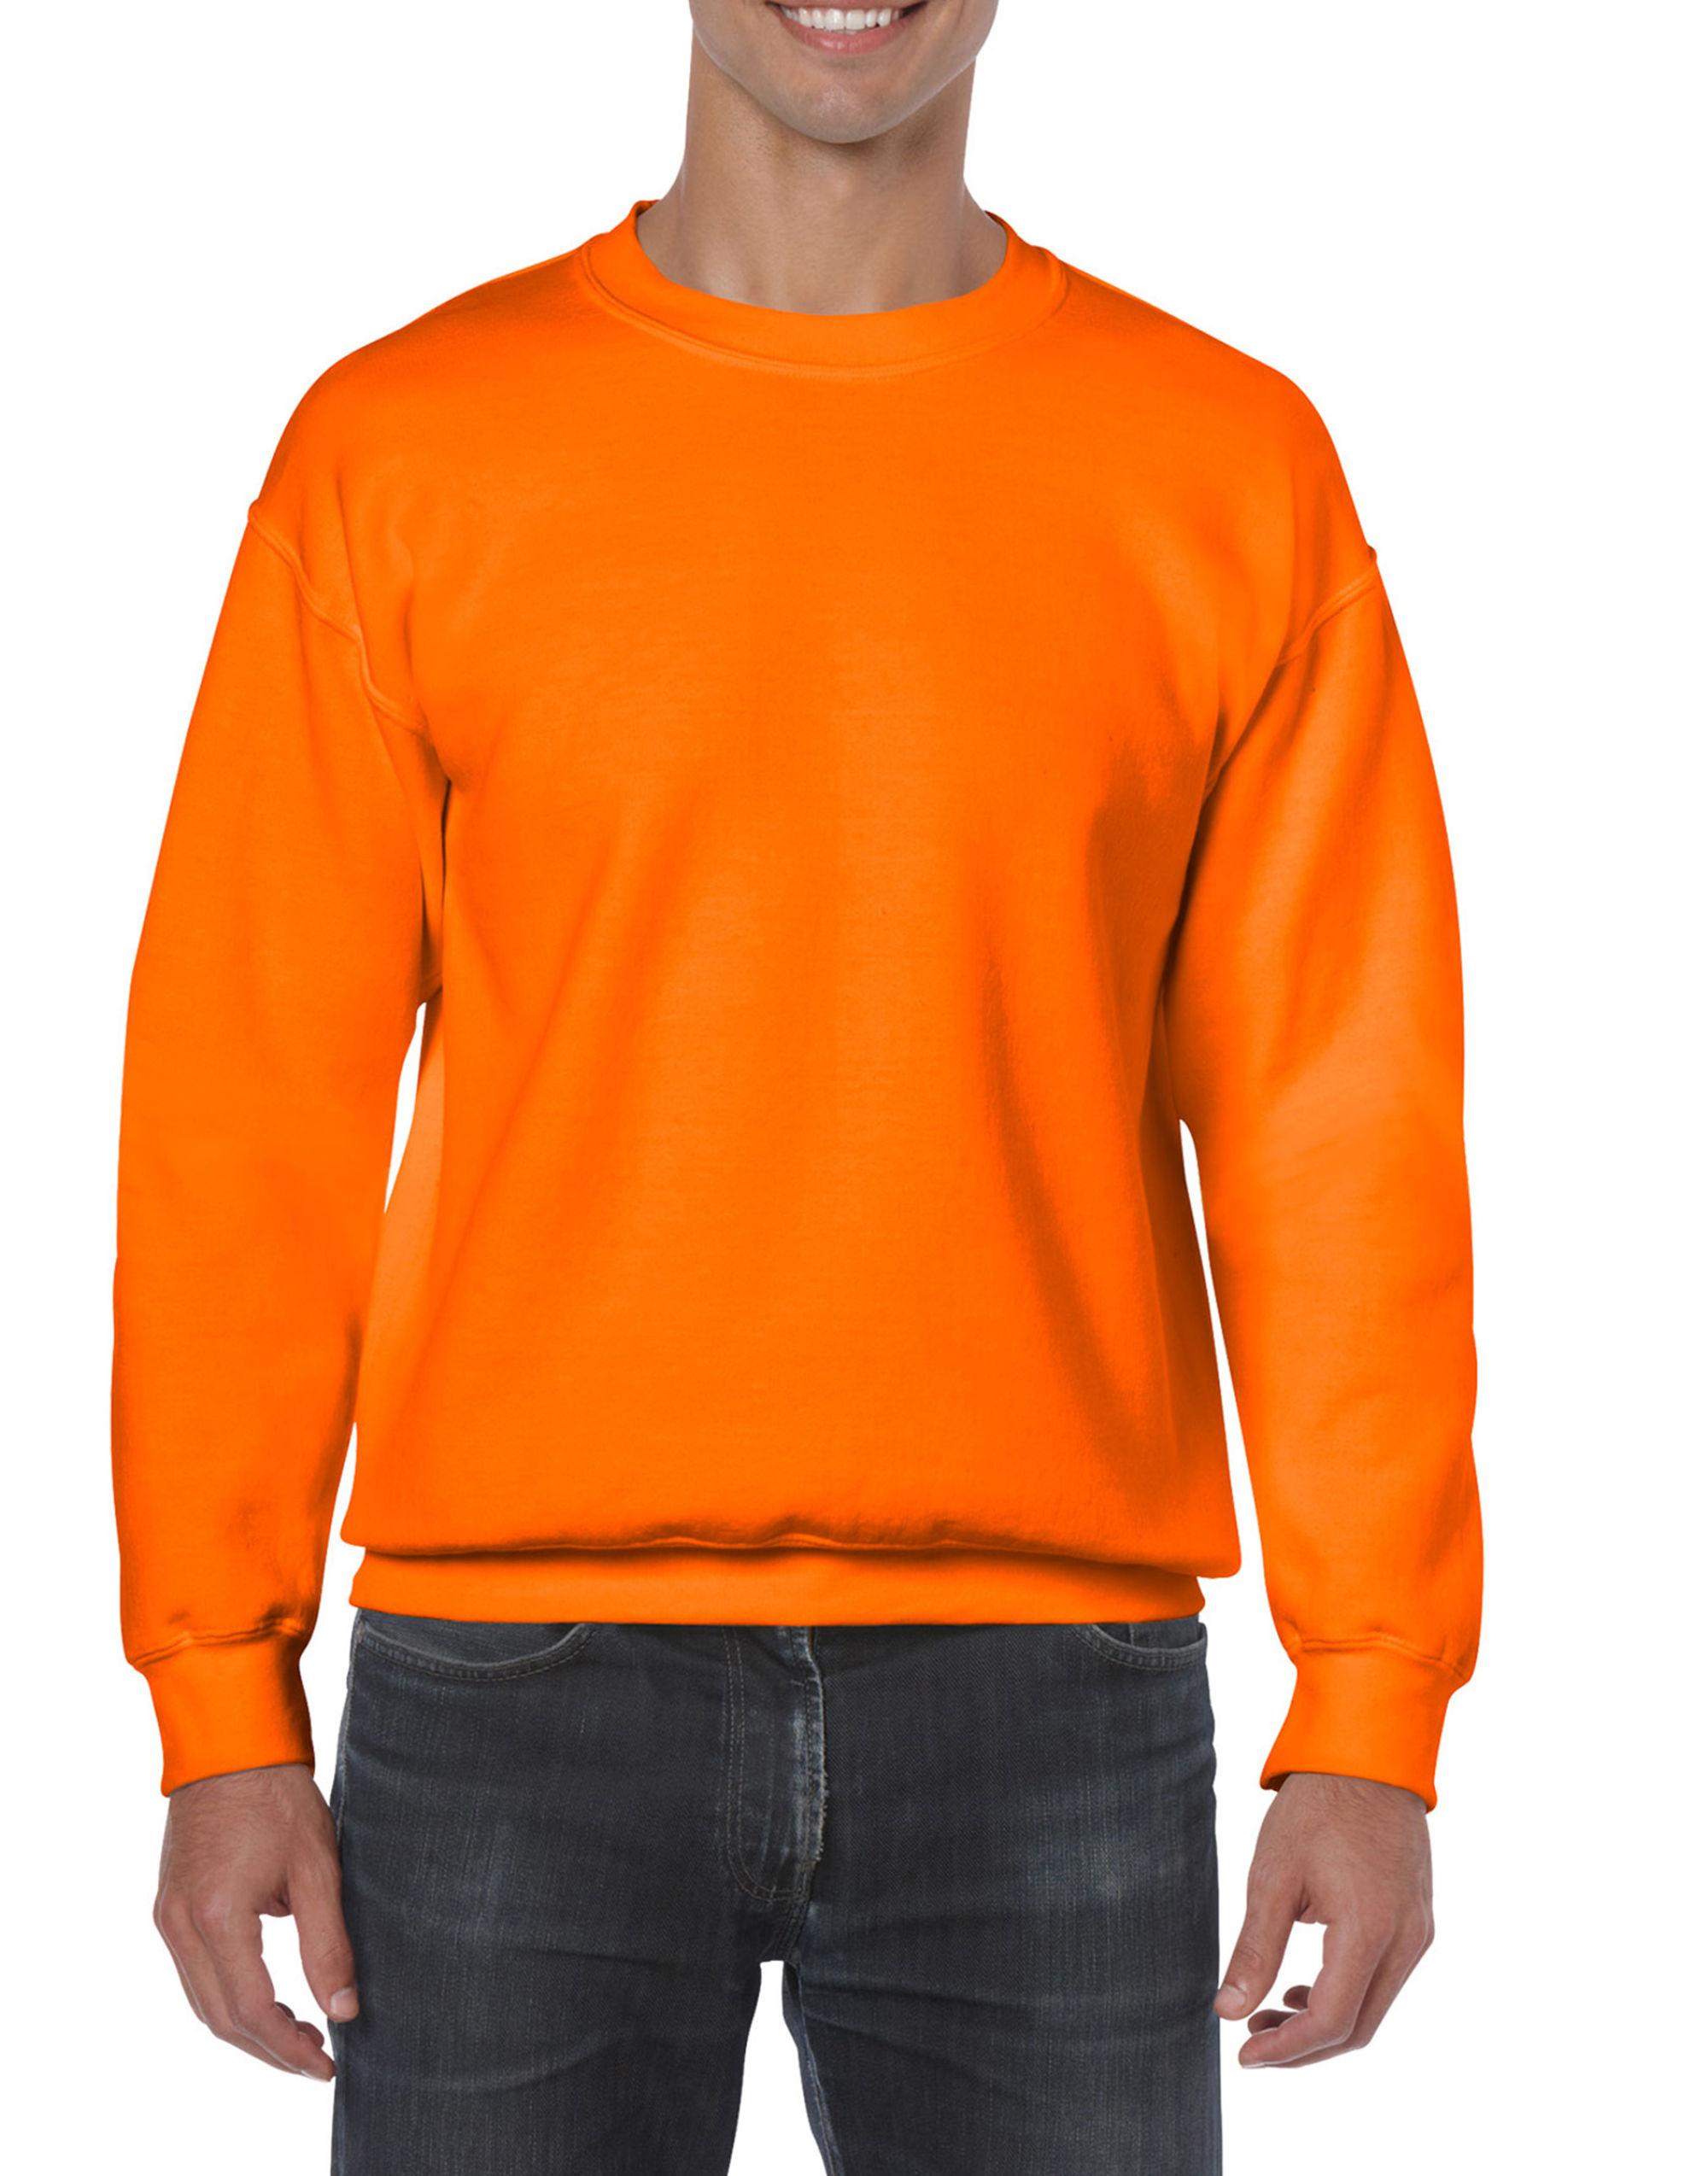 Heavy Blend 50/50 Sweatshirt